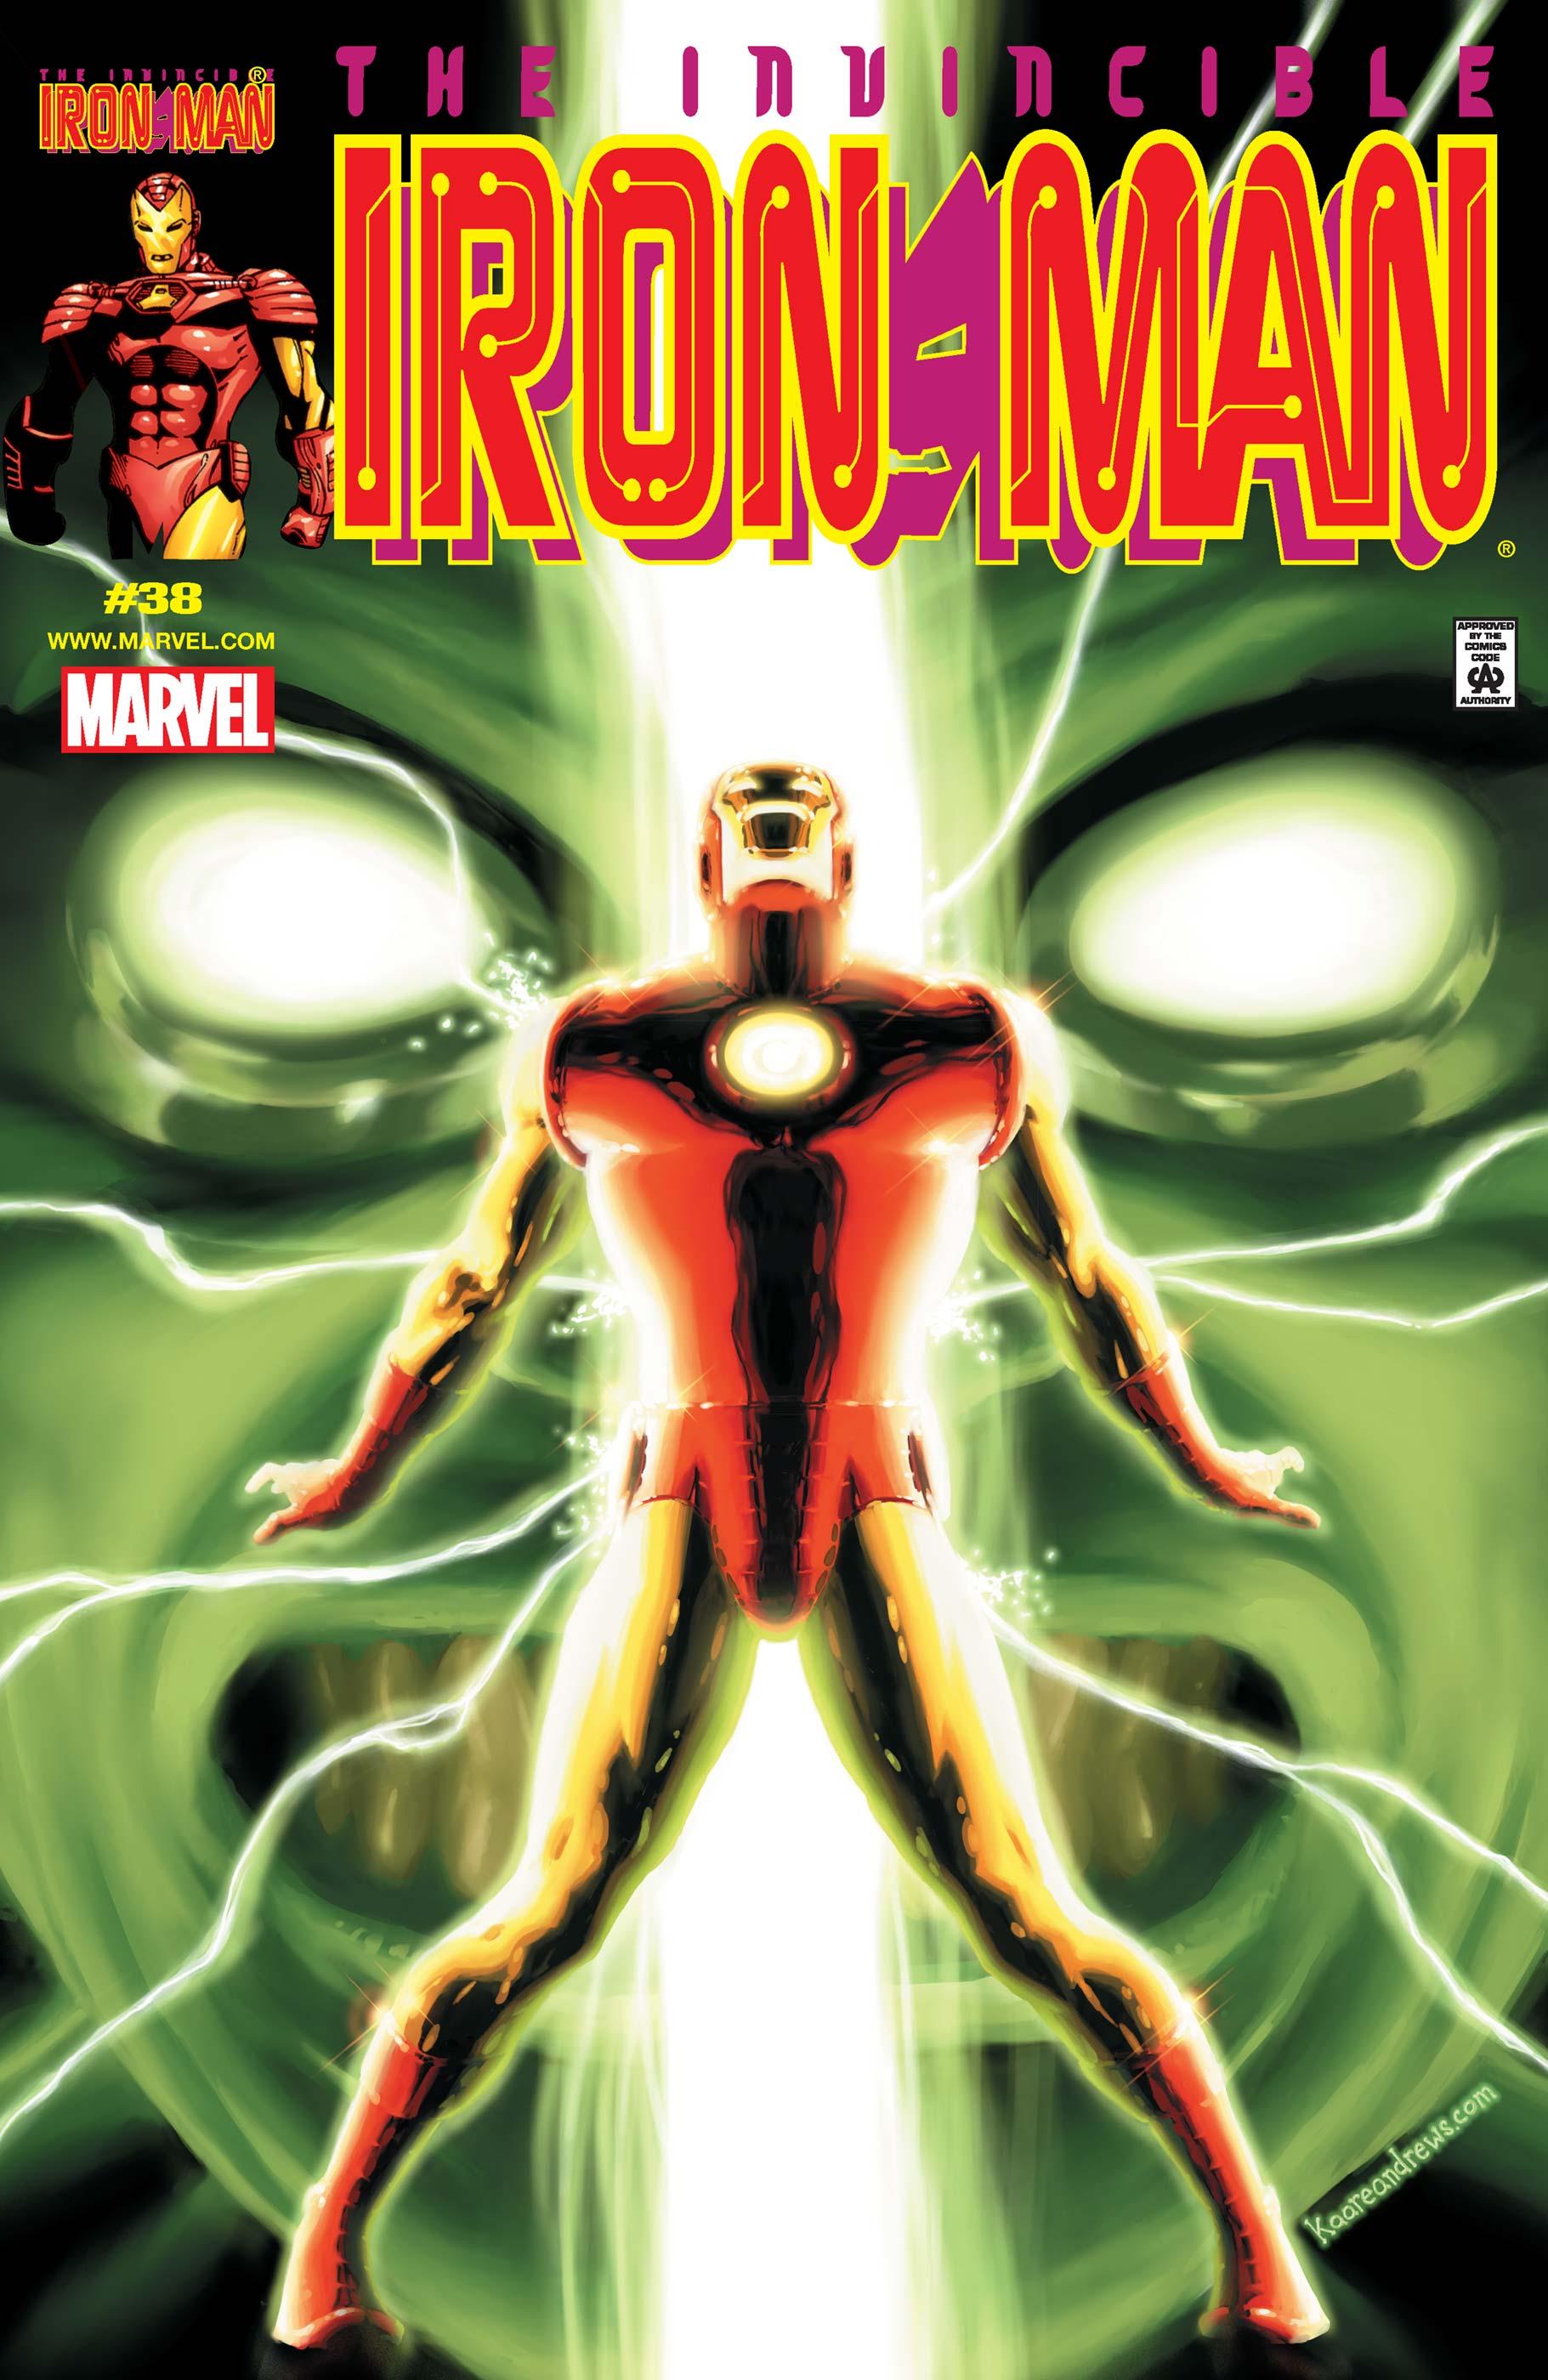 Iron Man (1998) #38